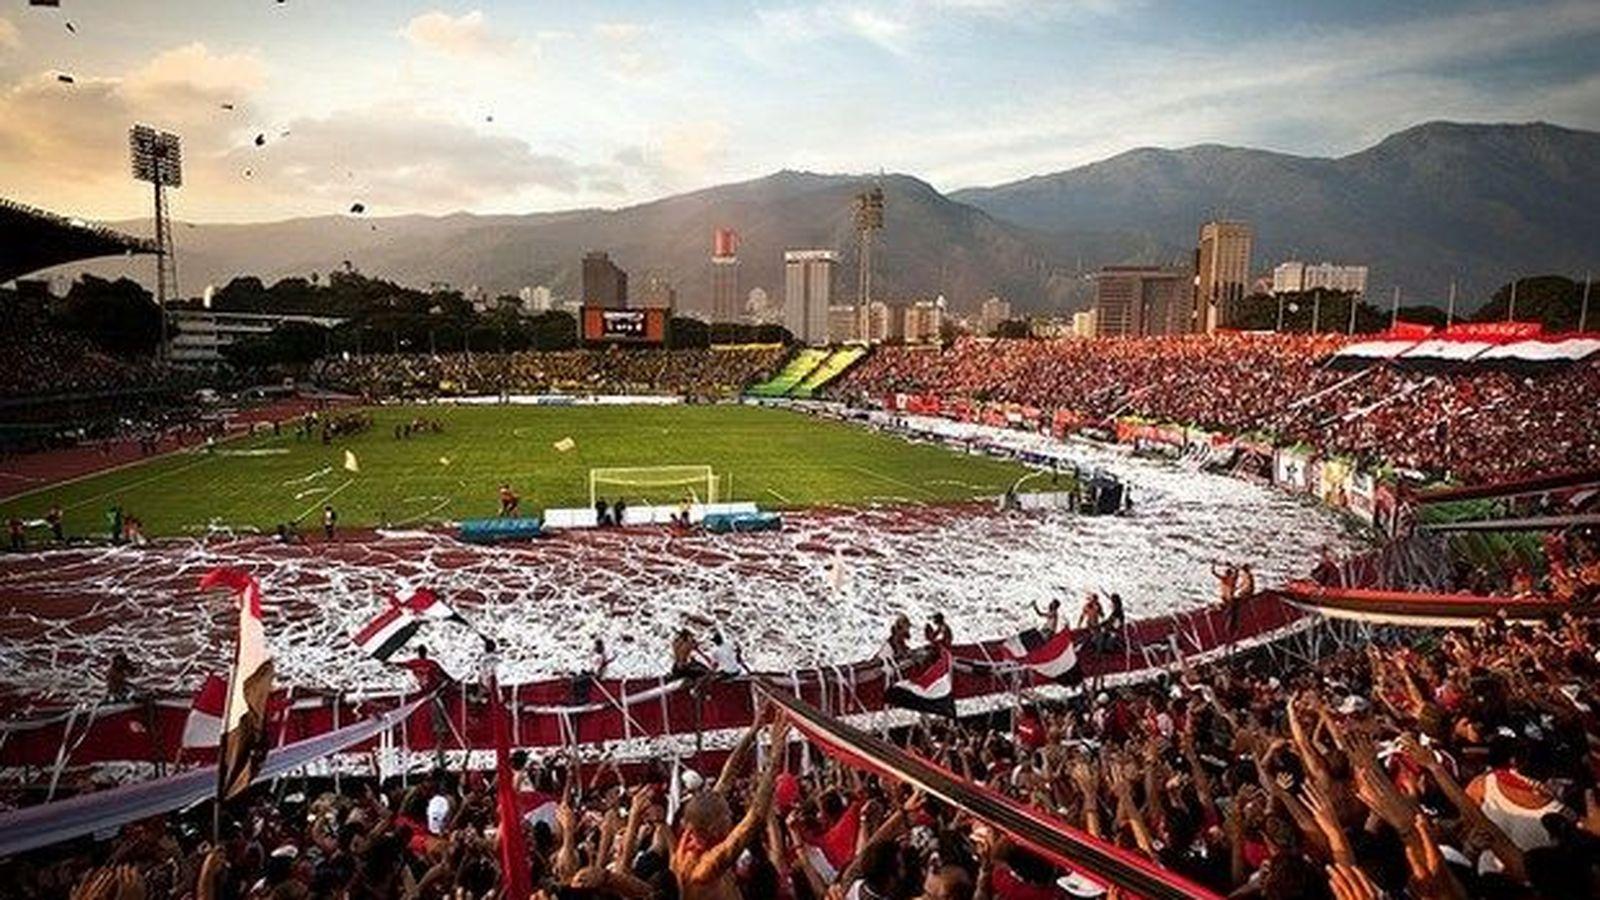 Foto: Estadio Pachencho Romero de Maracaibo, hasta la bandera. FOTO: DANIEL LÓPEZ